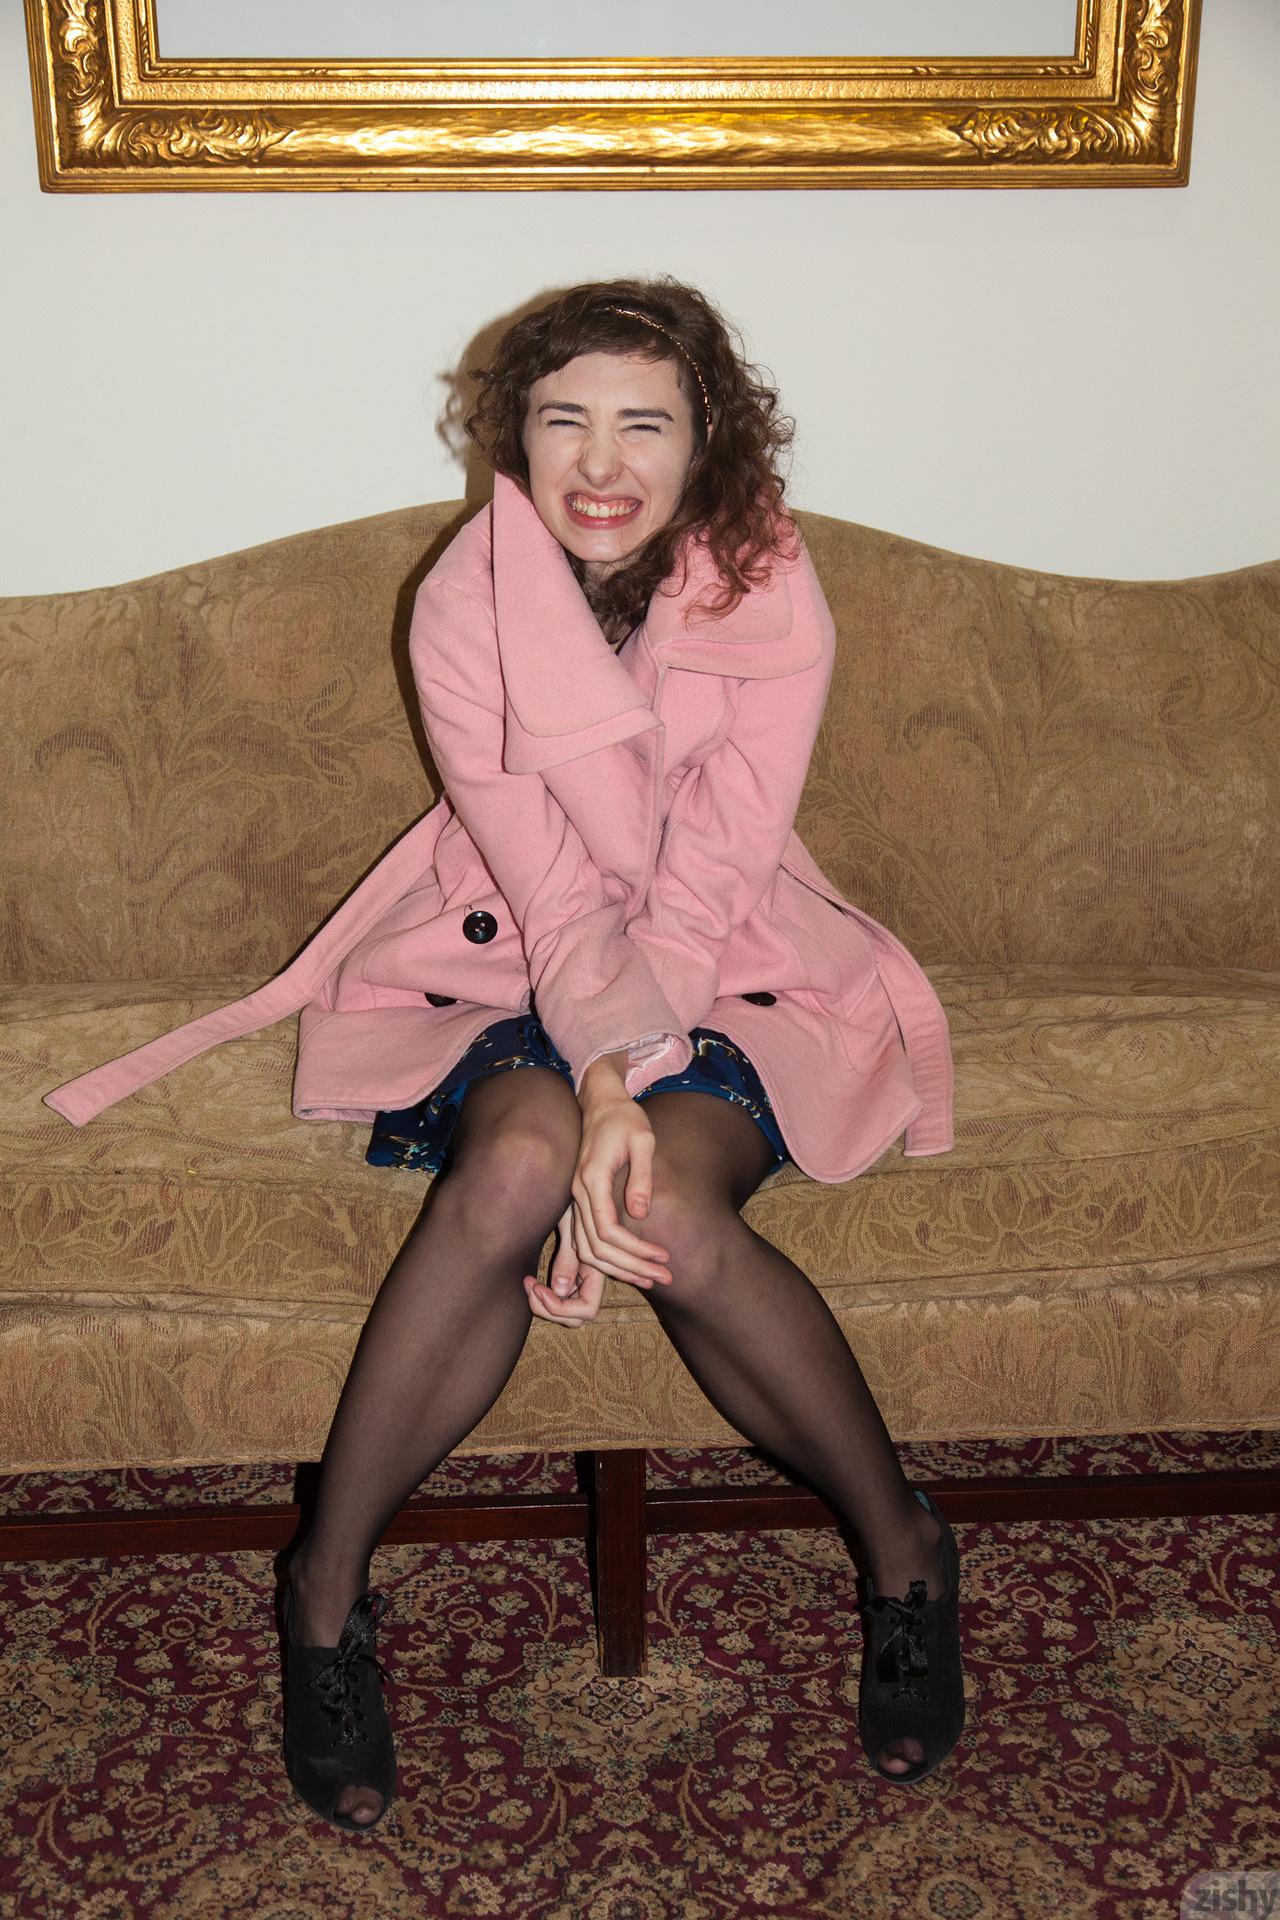 Yvette Nolot At Arizona Inn Zishy (24)